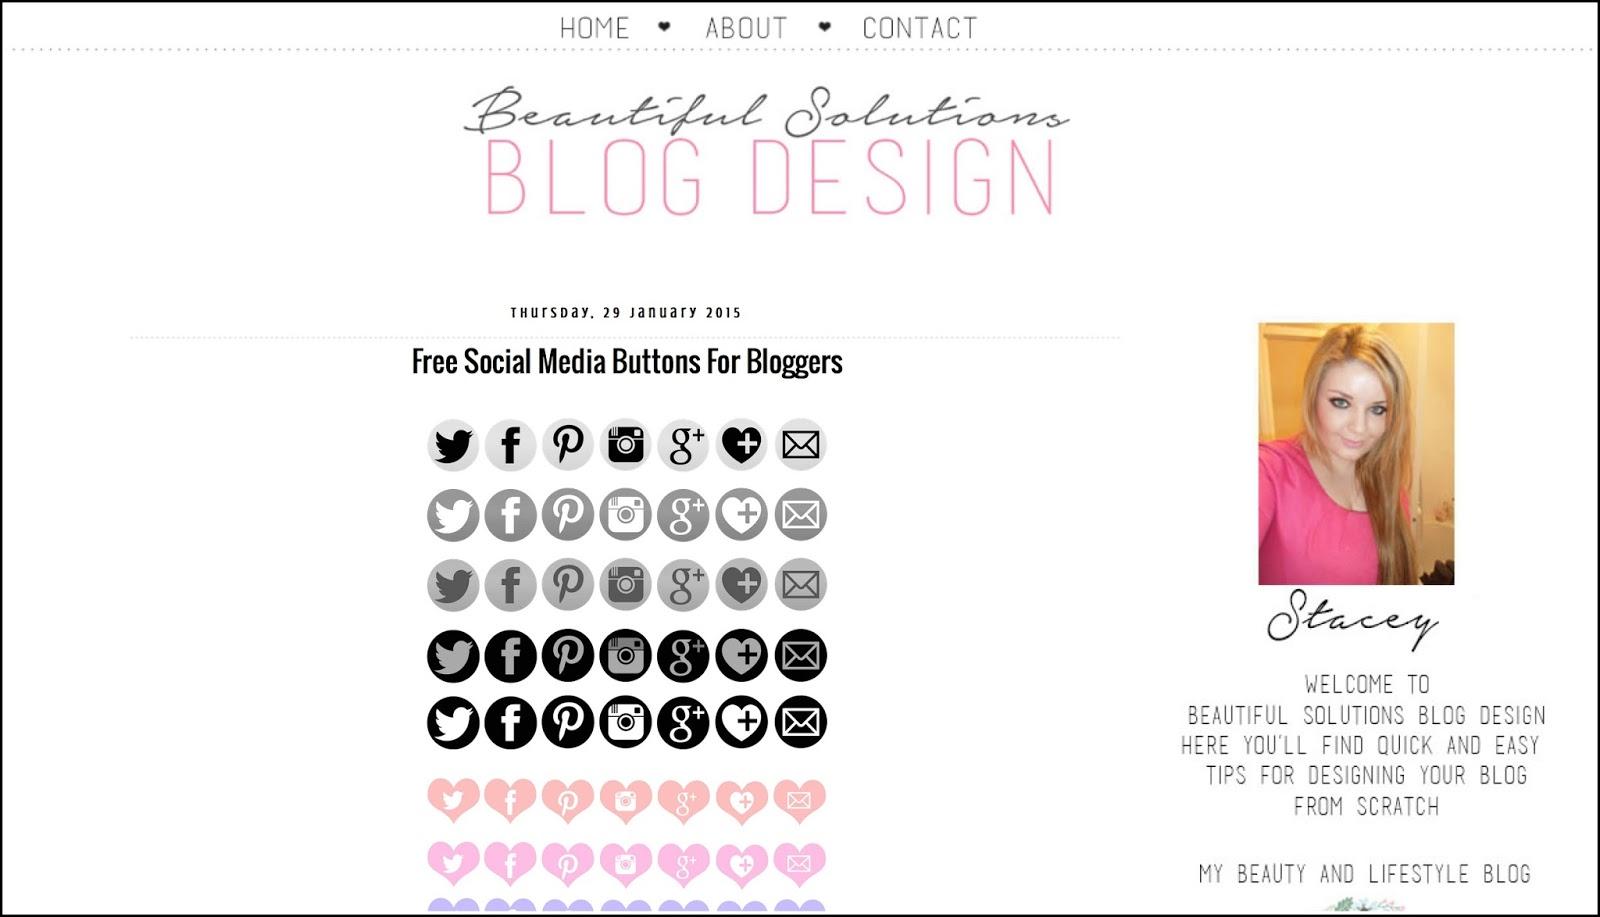 www.beautifulsolutionsblogdesign.blogspot.co.uk